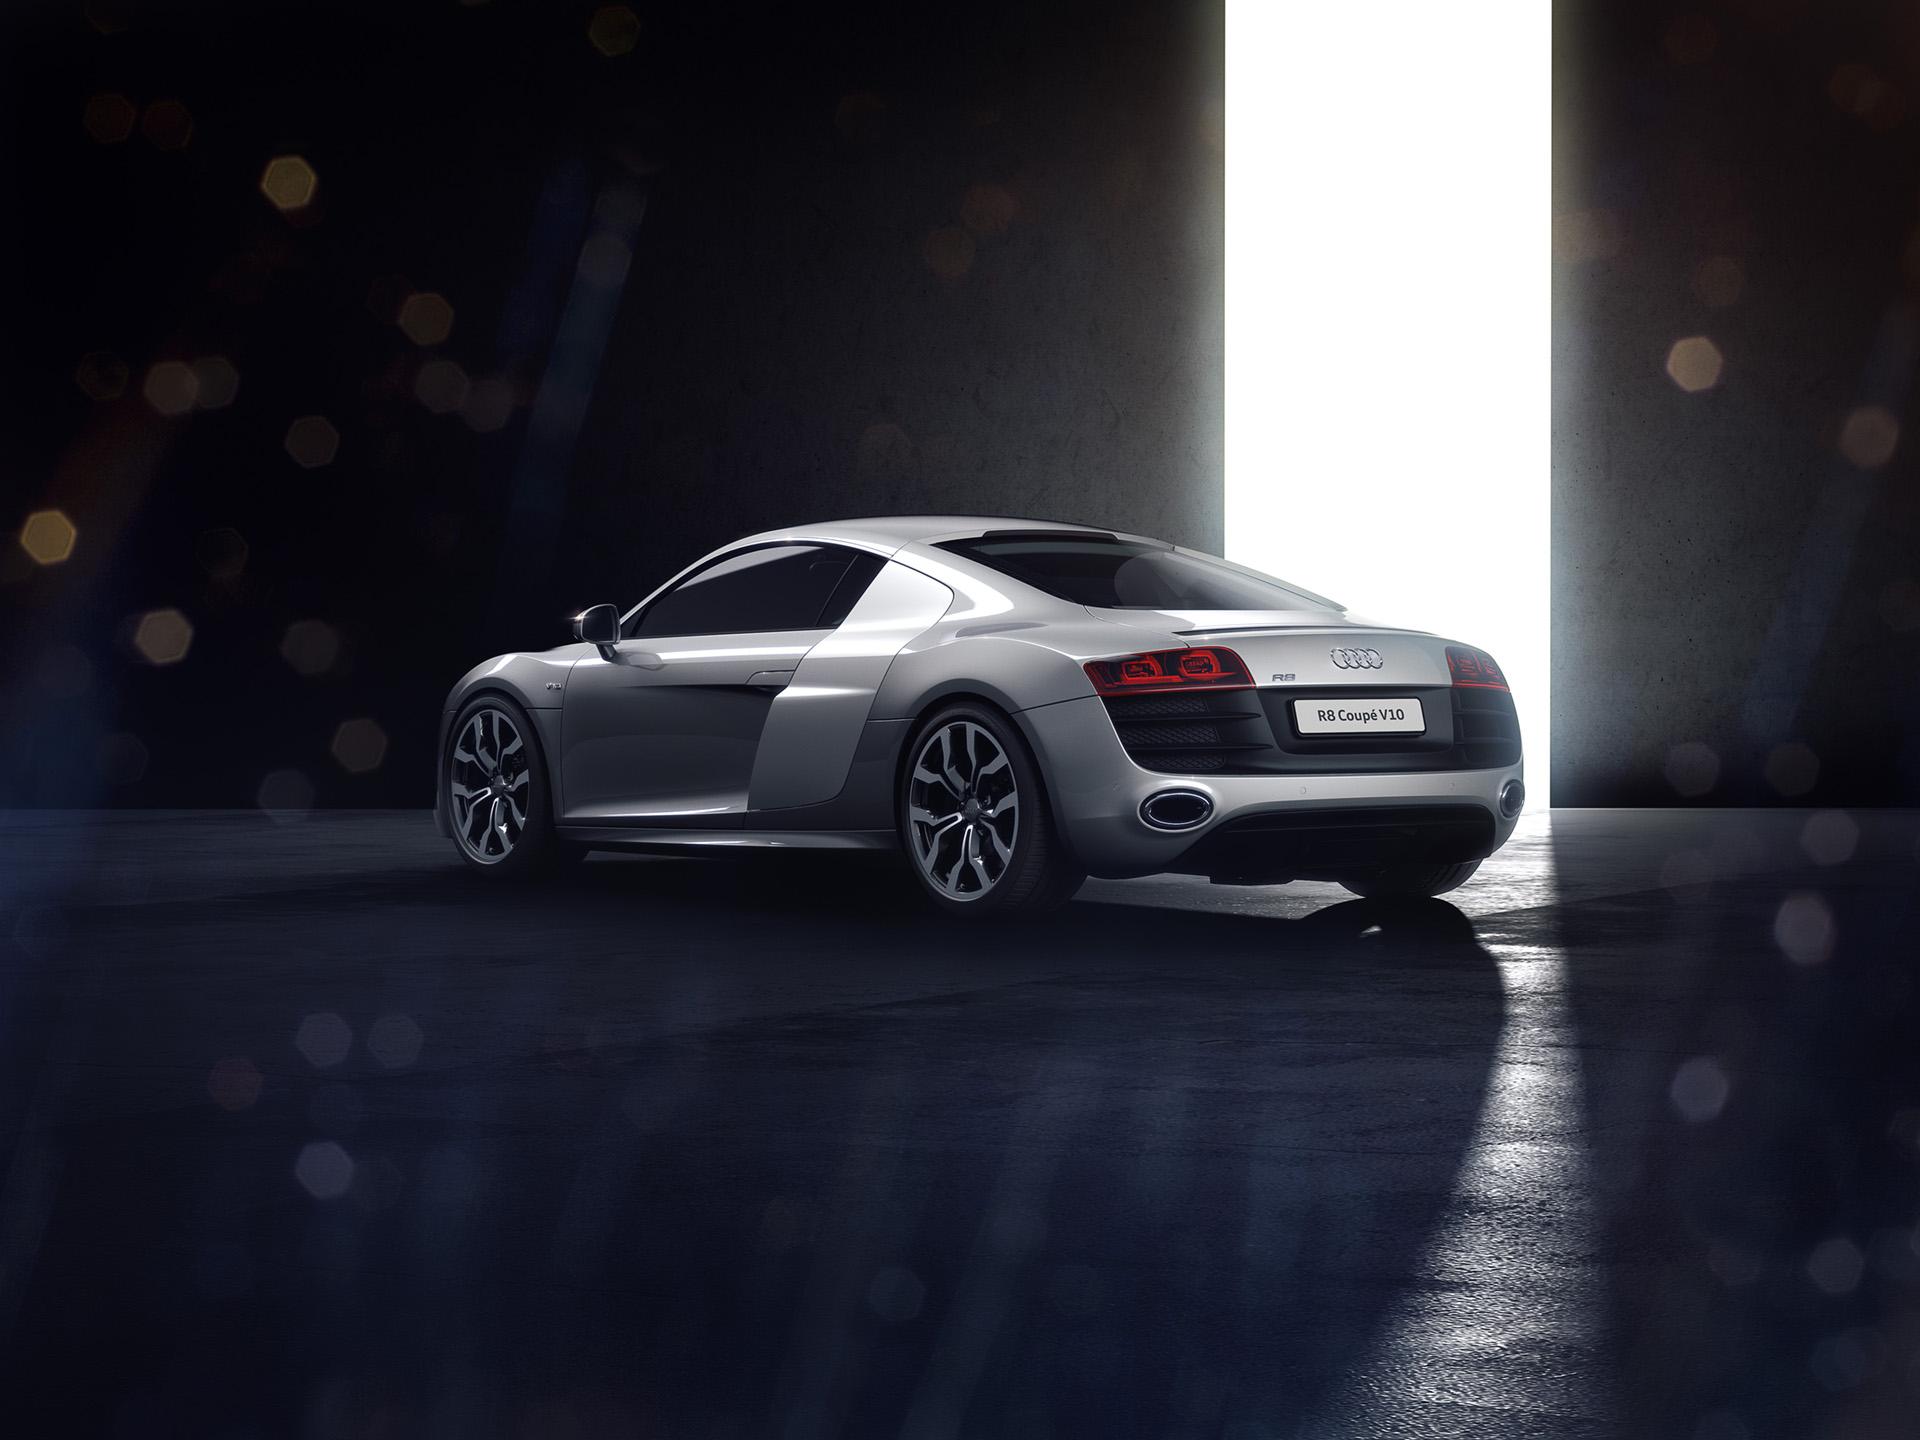 Audi_R8_Coupe_Rear34.jpg